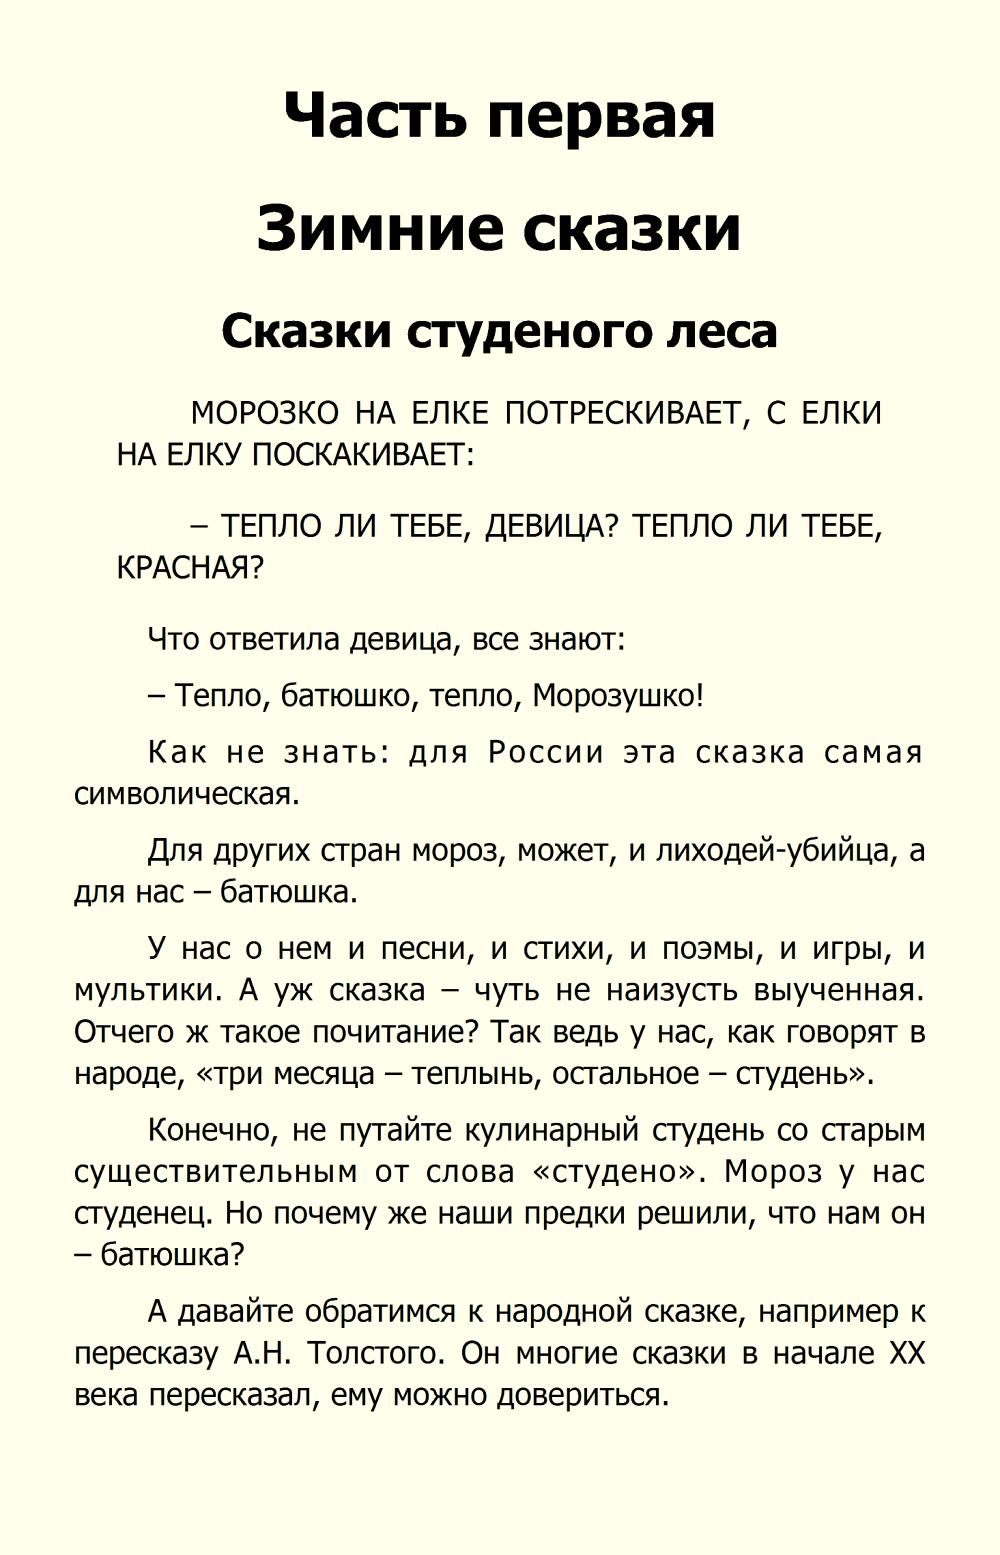 http://i1.imageban.ru/out/2014/01/25/5ef3f92ca6136898e7ba8f0072dd9acc.jpg